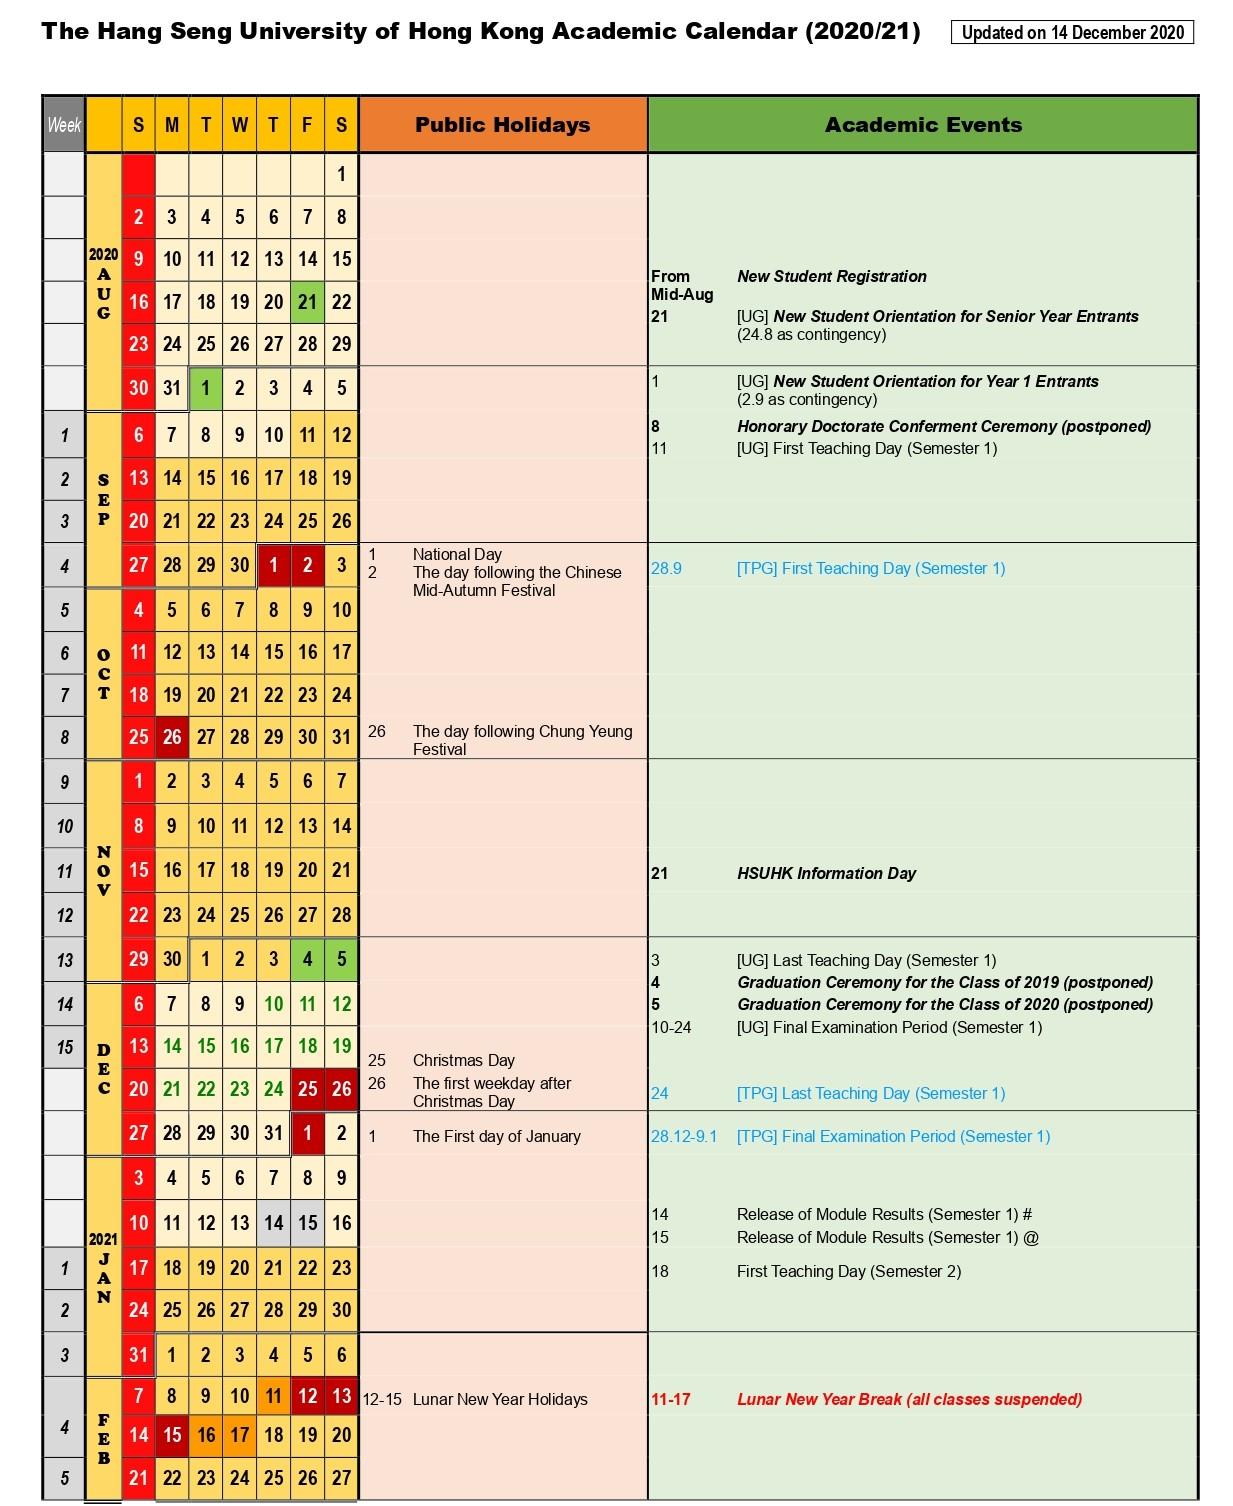 Academic Calendar 2020-21 (11 Sept) 20201214_page-0001